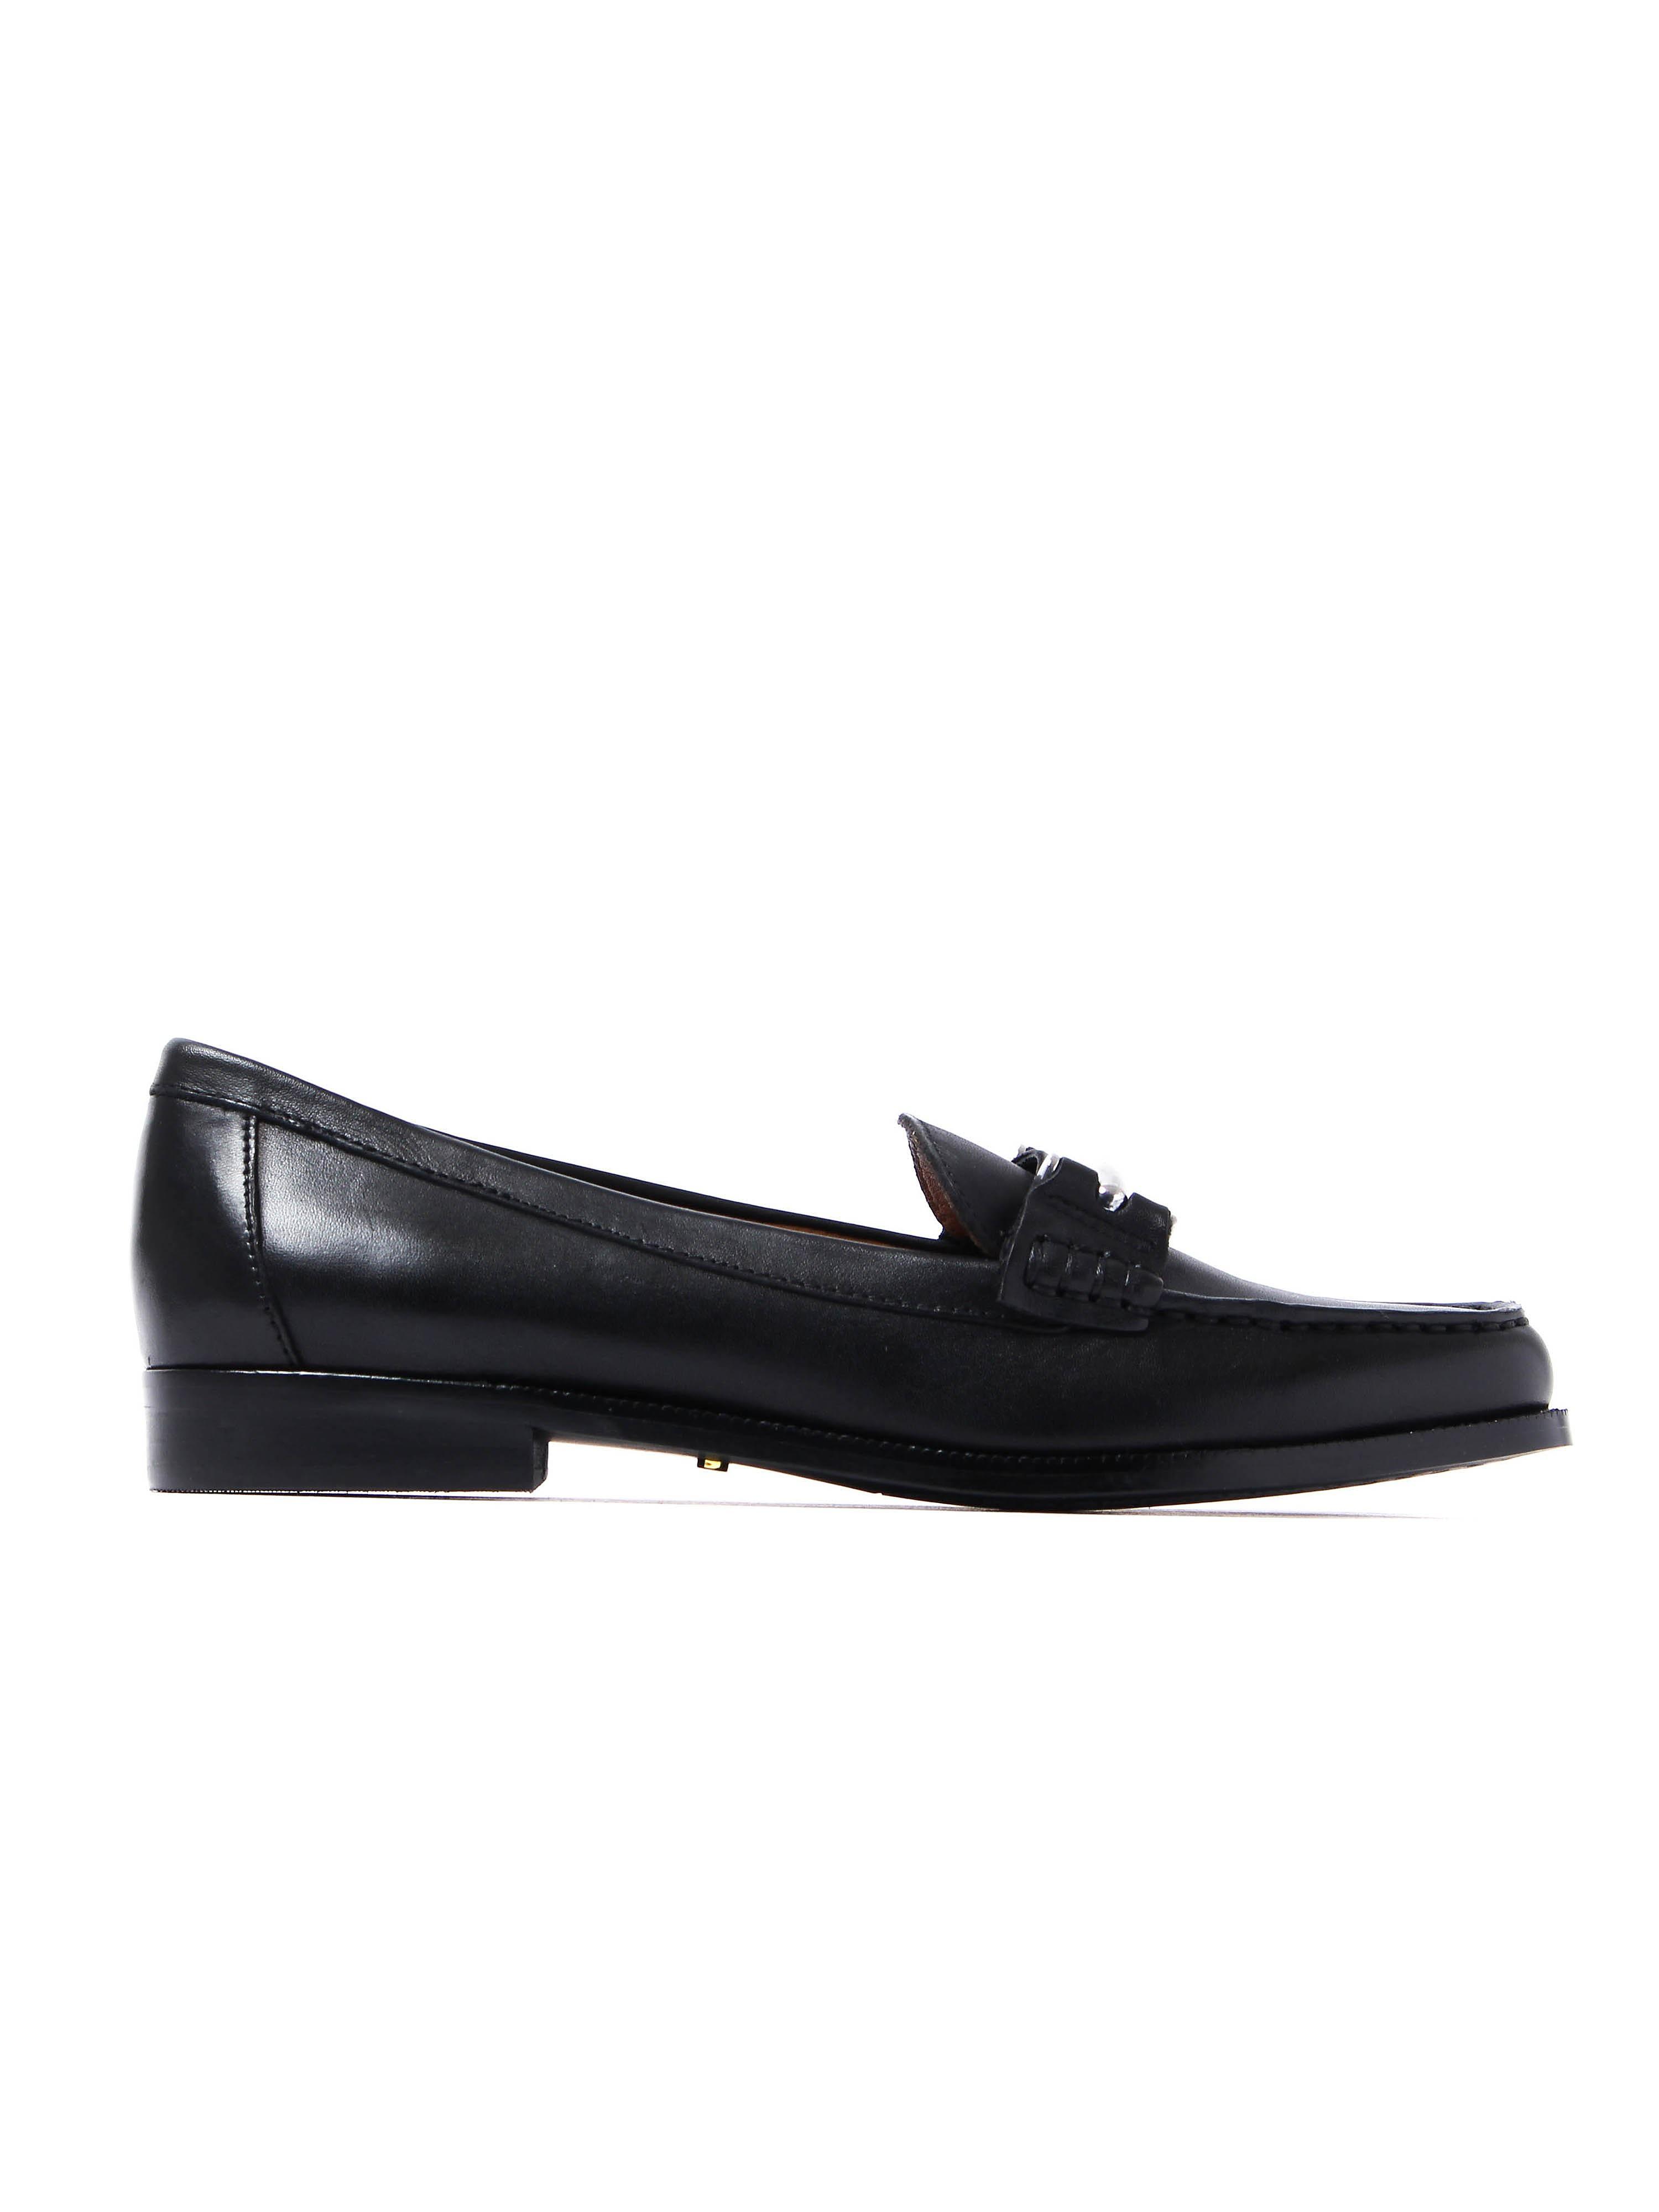 Lauren Ralph Lauren Women's Flynn Loafers - Black Leather